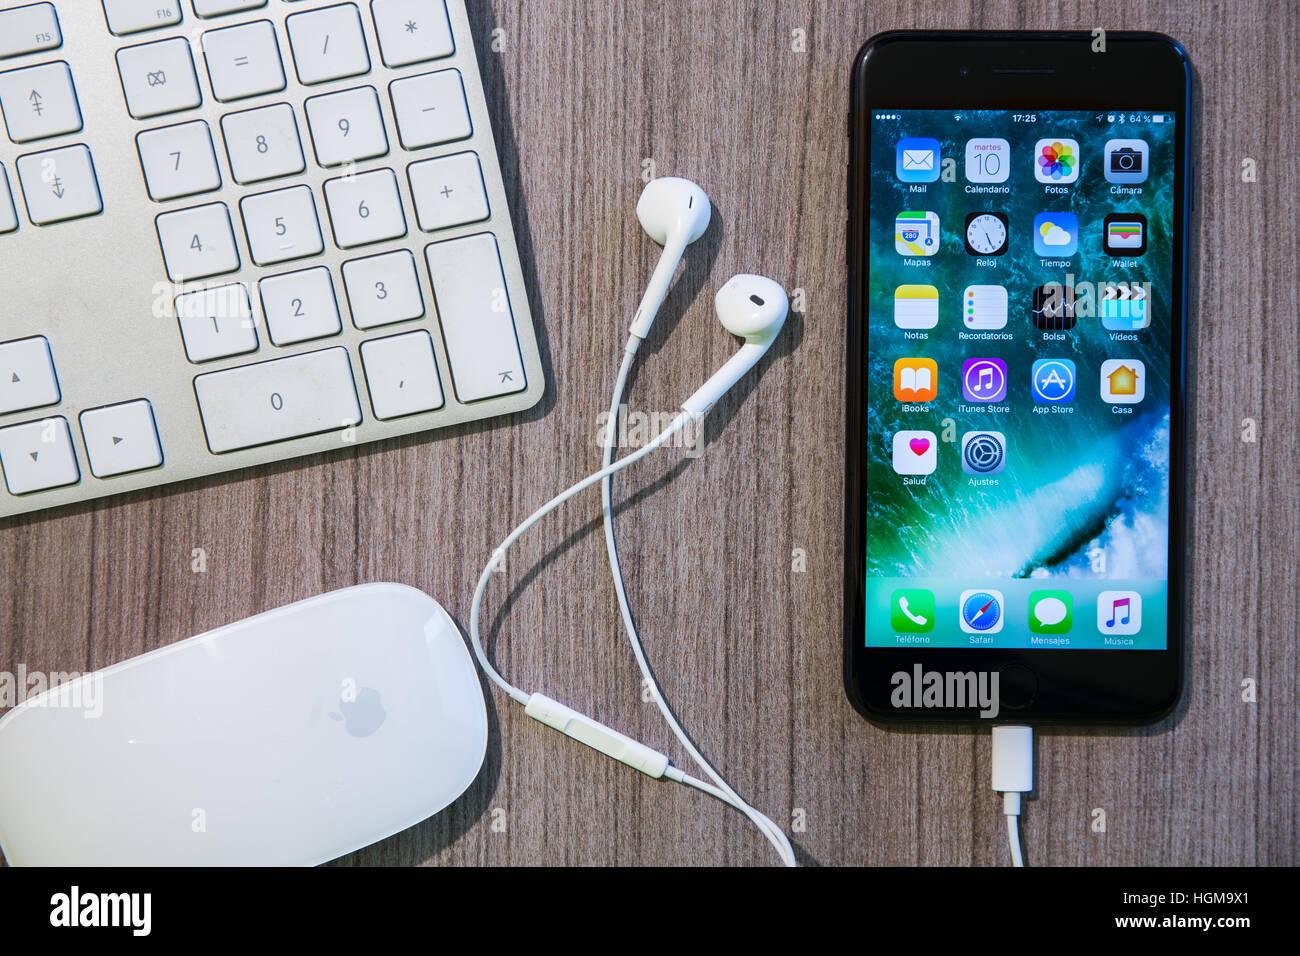 Apple Iphone Plus Display Apps Stock Photos Apple Iphone Plus